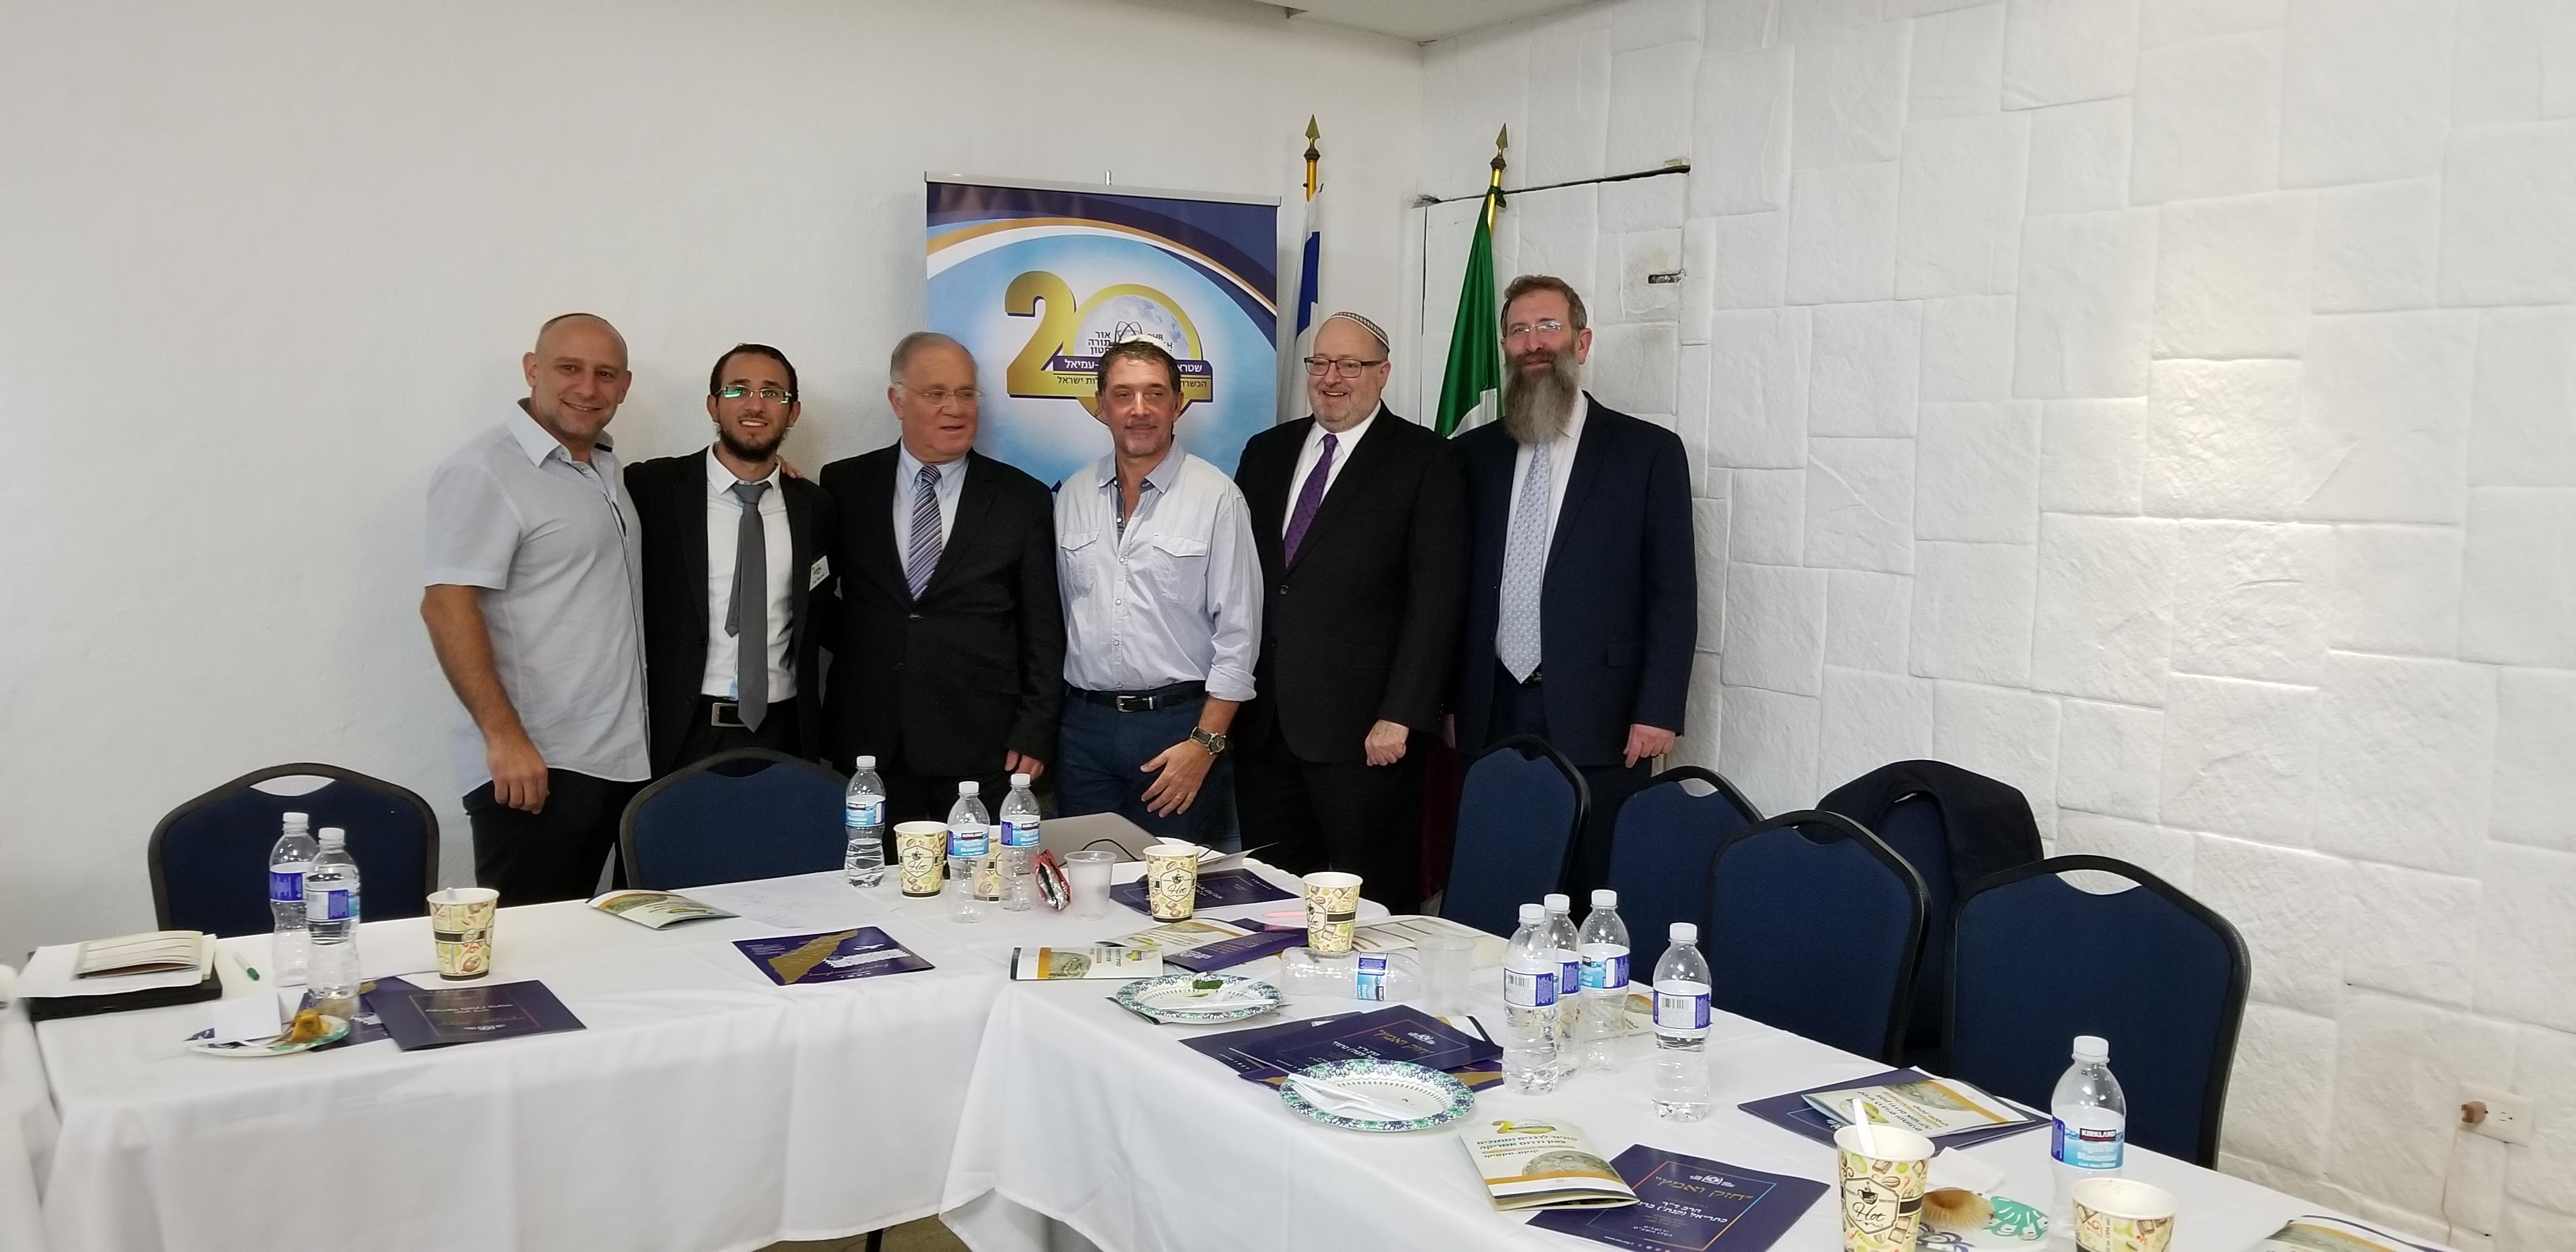 Eli Bari, Yehiel Wasserman, Rabbi Brander, Rabbi Birnbaum